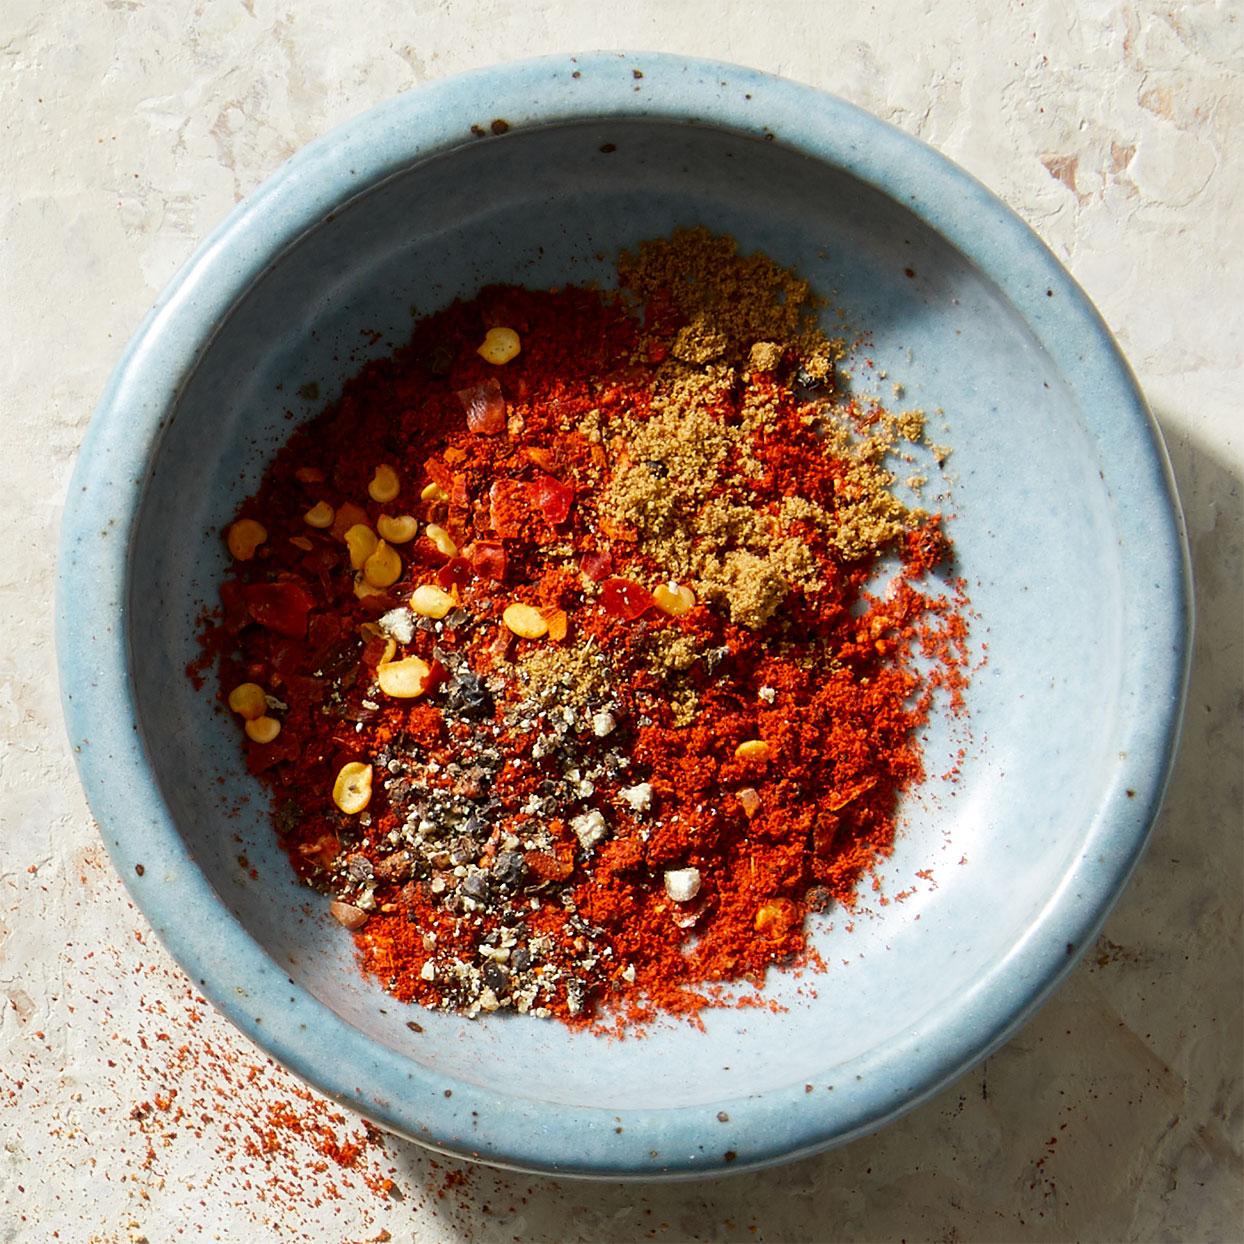 Spanish Seasoning Blend Trusted Brands